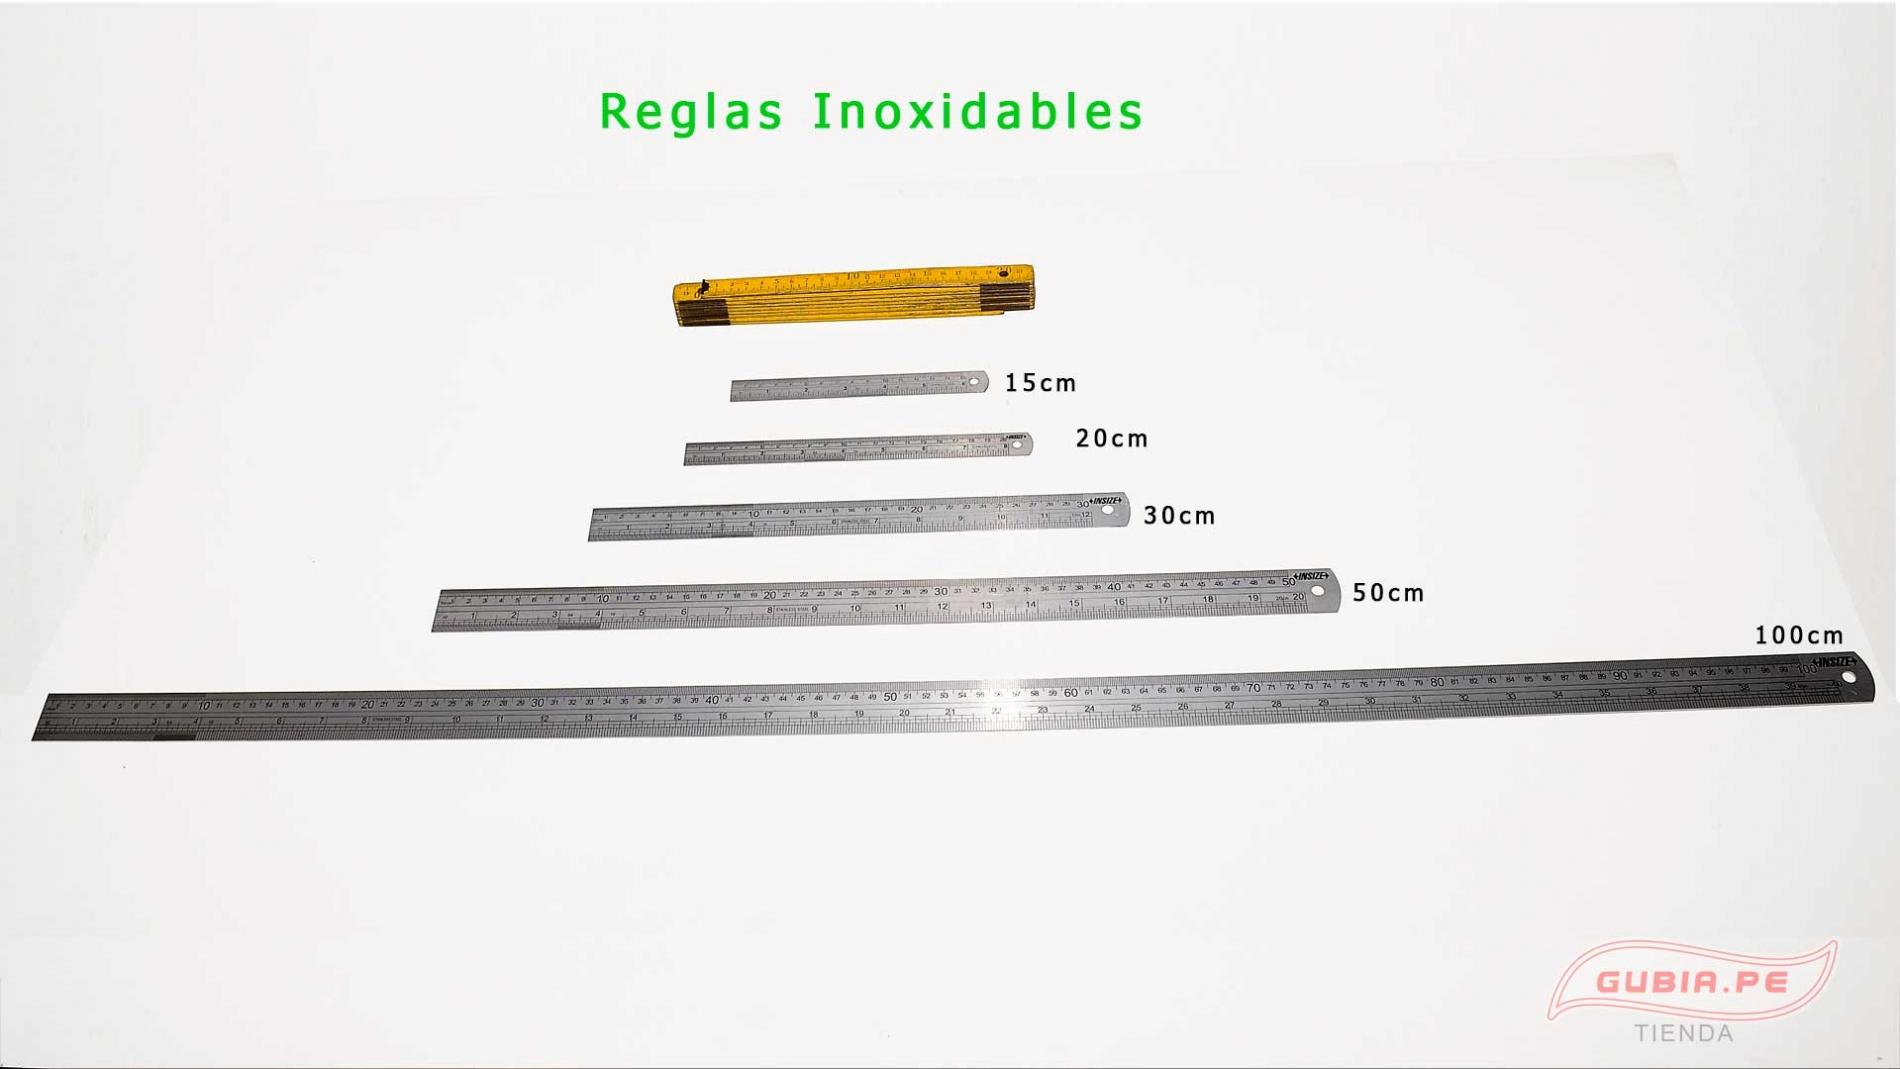 7110-1000-Regla inoxidable 1000mm Insize 7110-1000-max-4.